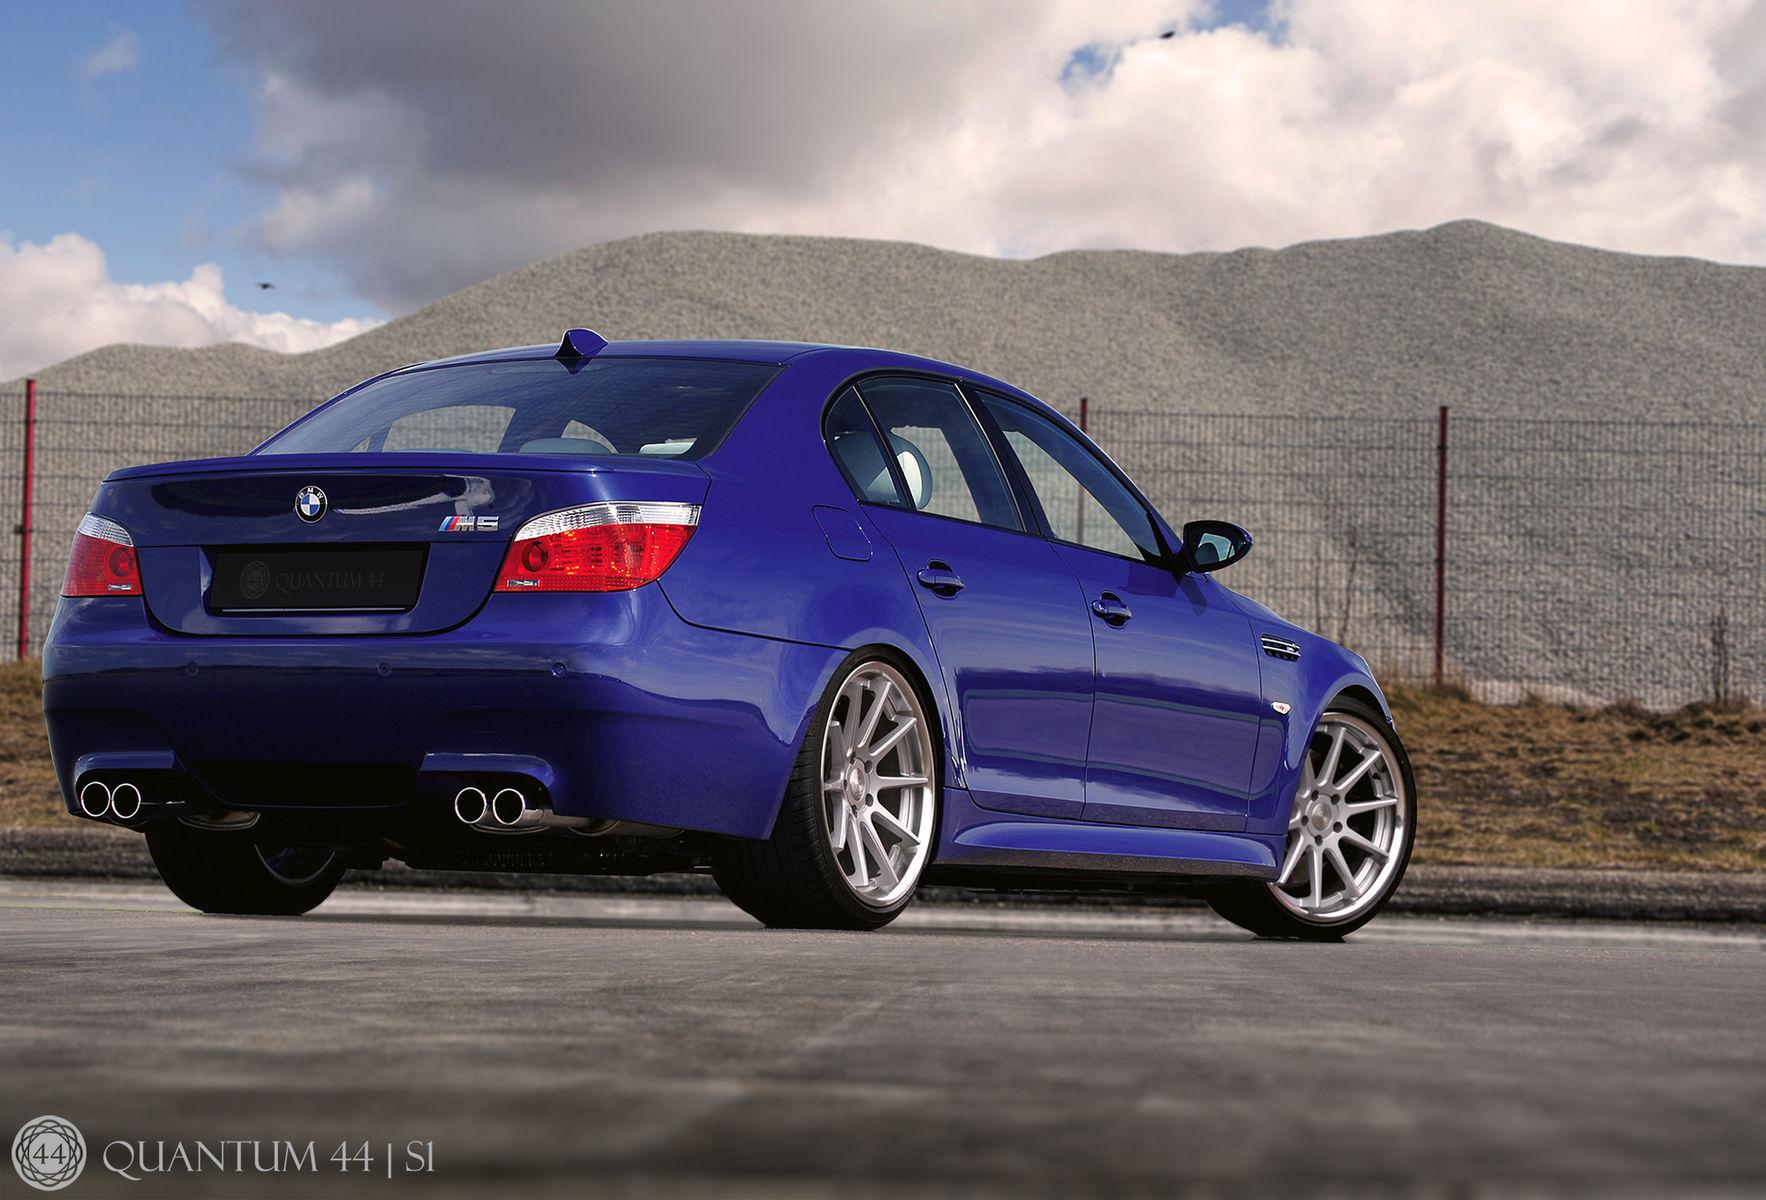 BMW M5 | Quantum44 S1 + BMW M5